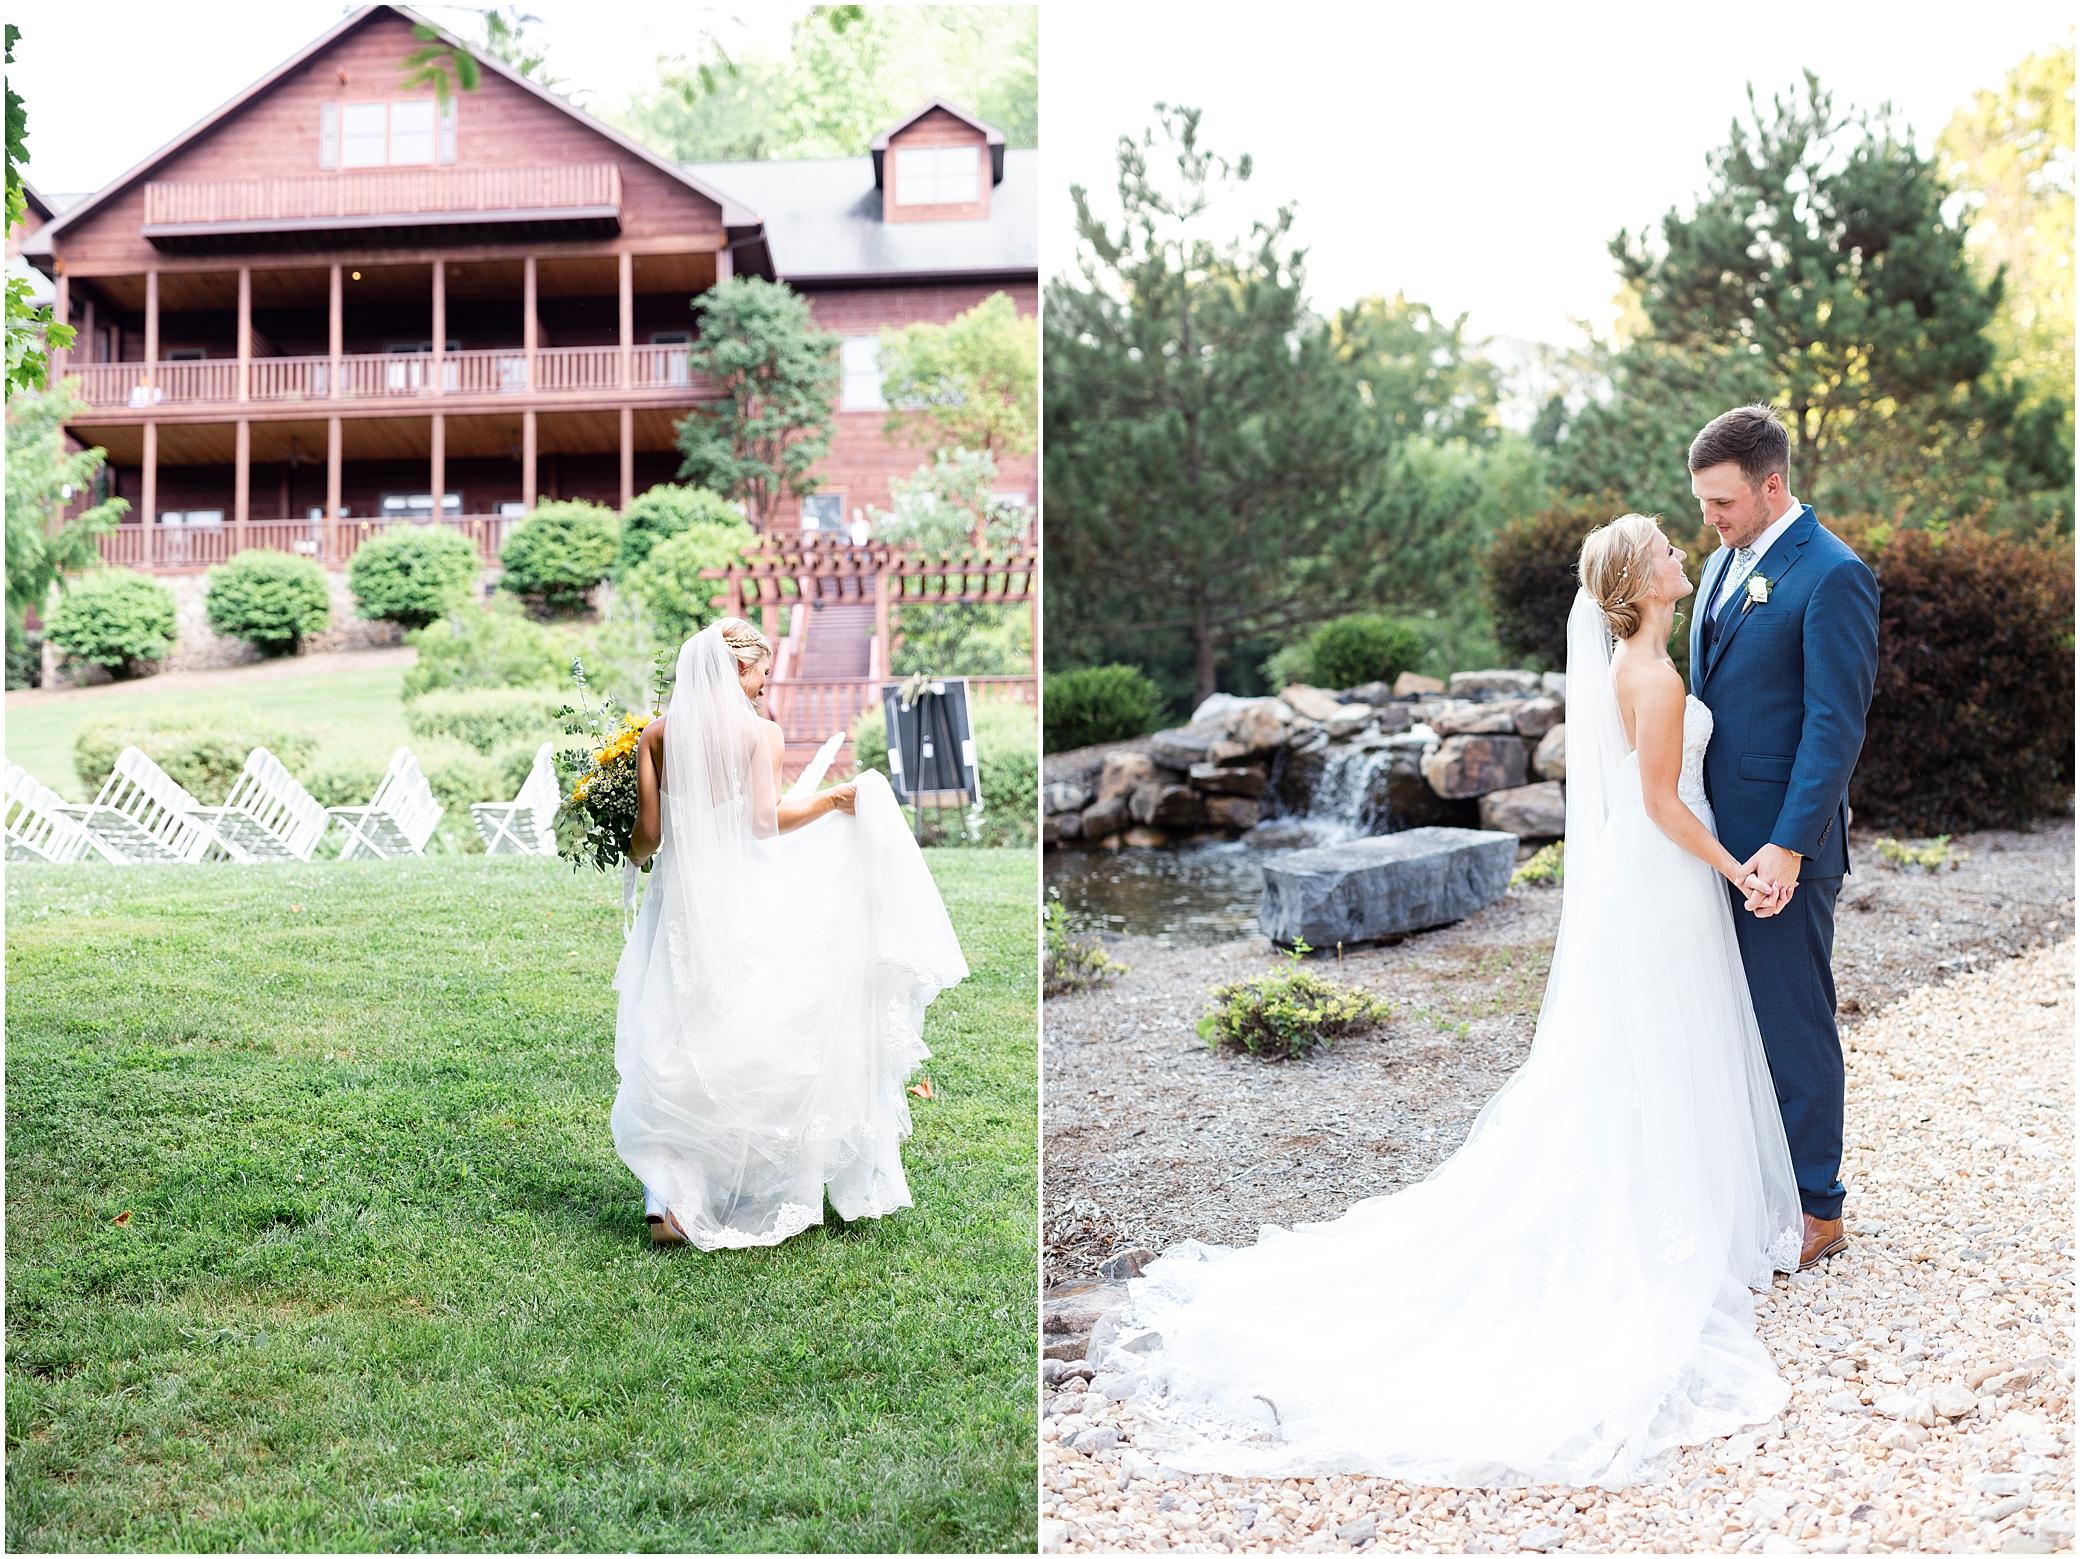 House Mountain Inn Wedding, Virginia wedding in the mountains, bridal portrait